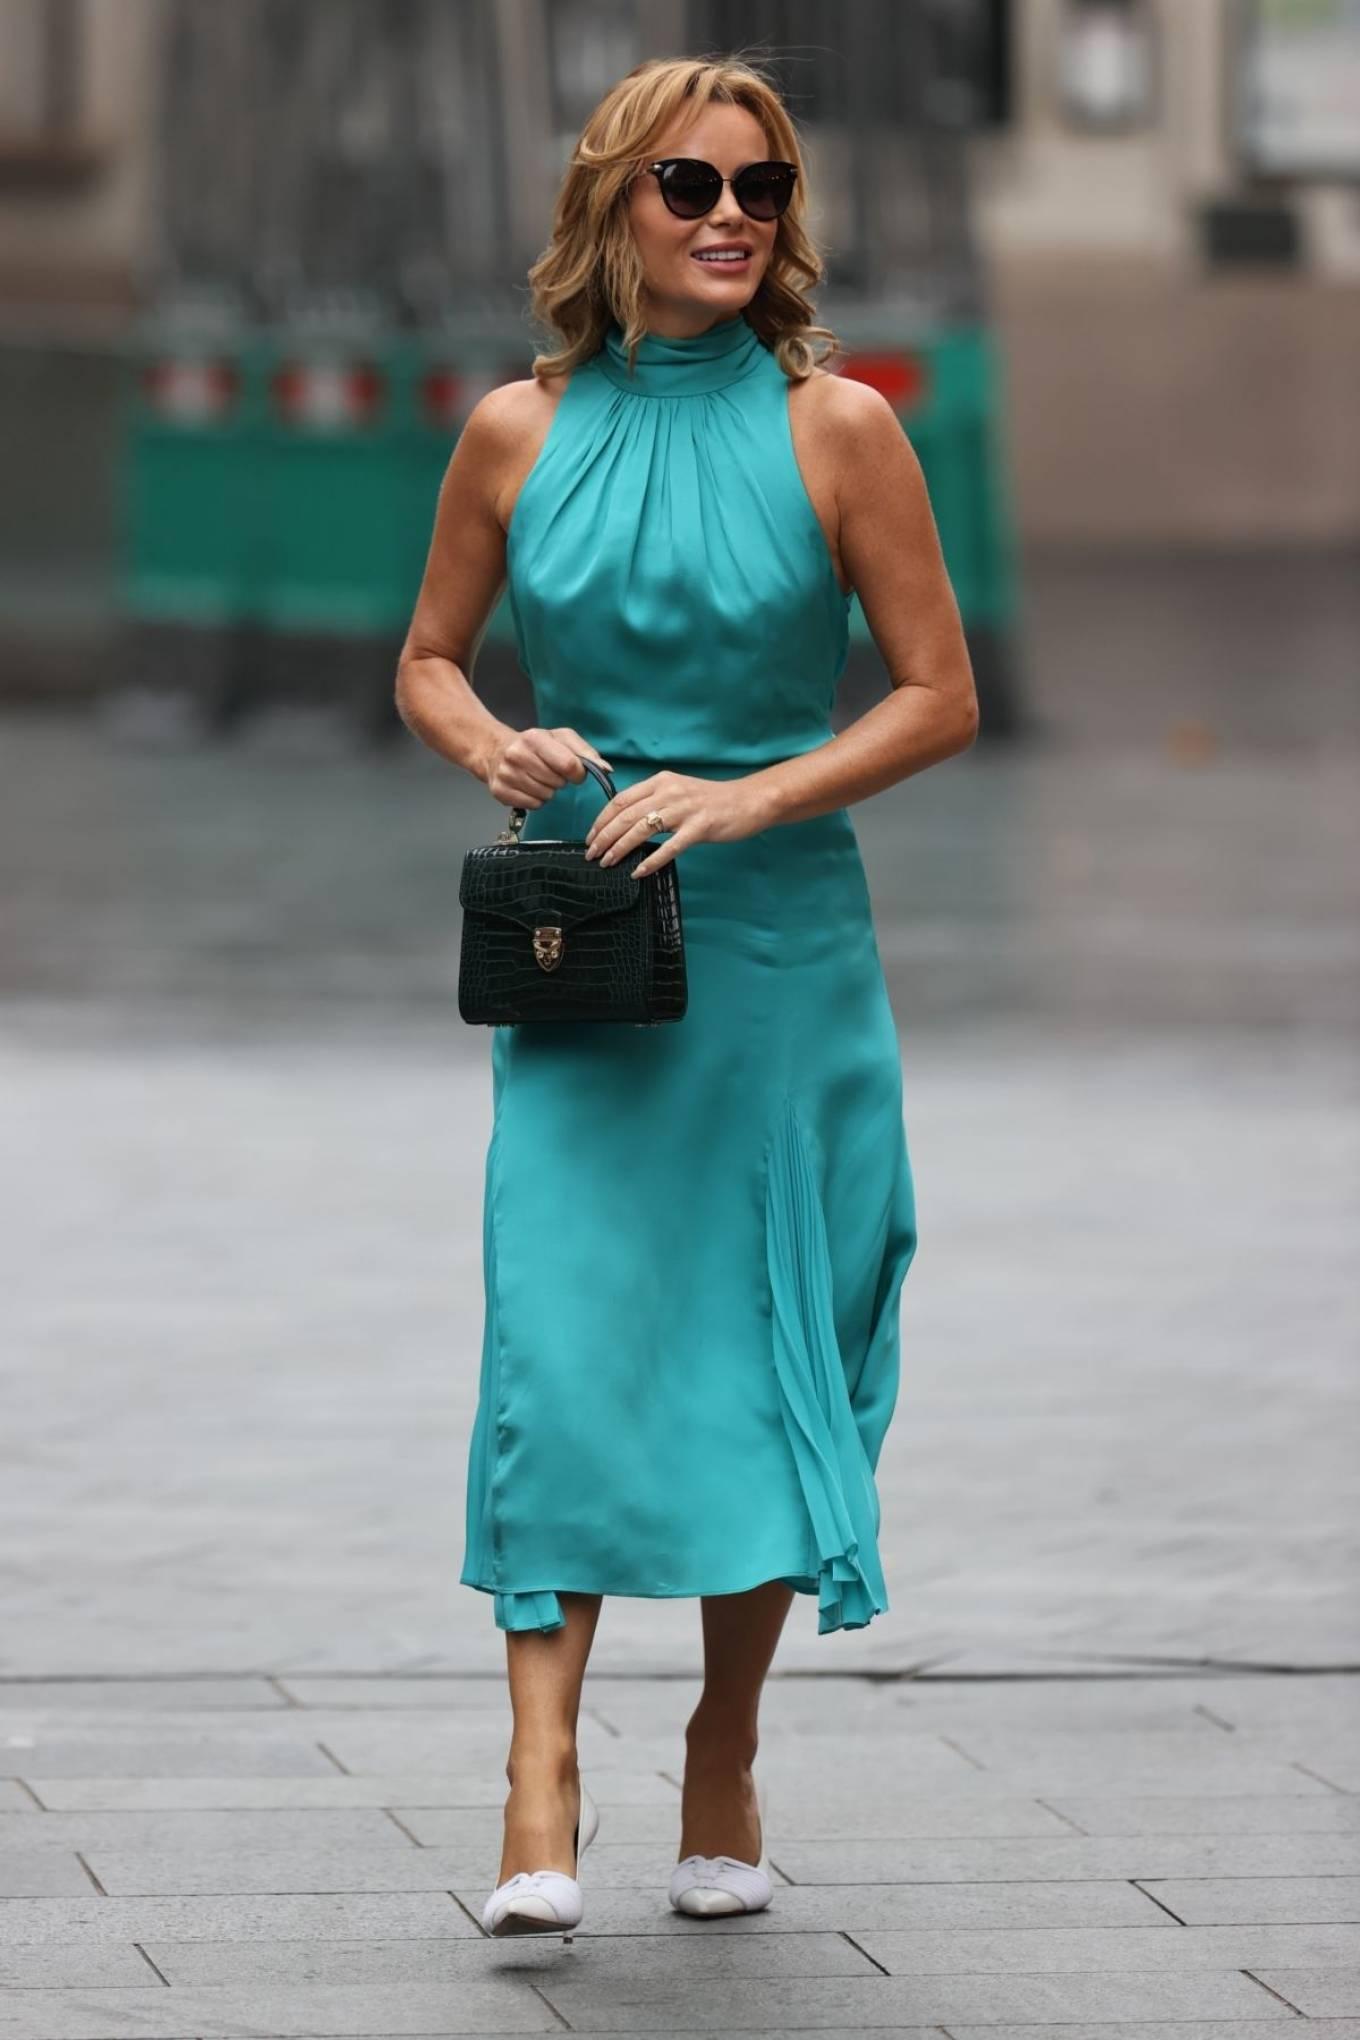 Amanda Holden 2020 : Amanda Holden – Looks stylish at Heart Radio in London-10